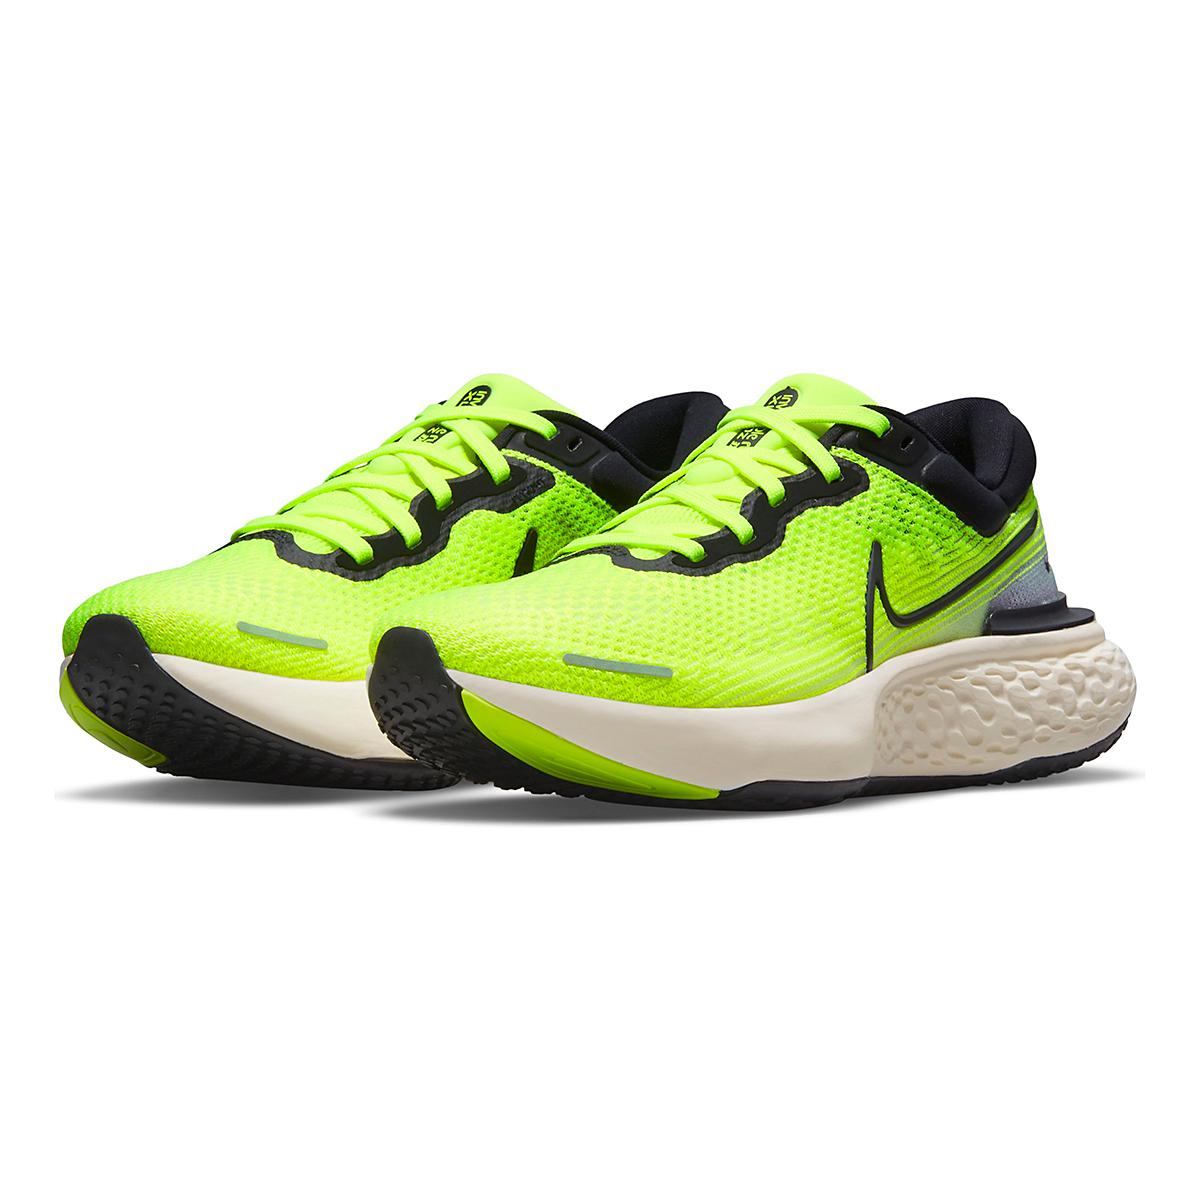 Men's Nike Zoomx Invincible Run FlyKnit Running Shoe - Color: Volt/Black/Barely Volt - Size: 6 - Width: Regular, Volt/Black/Barely Volt, large, image 3